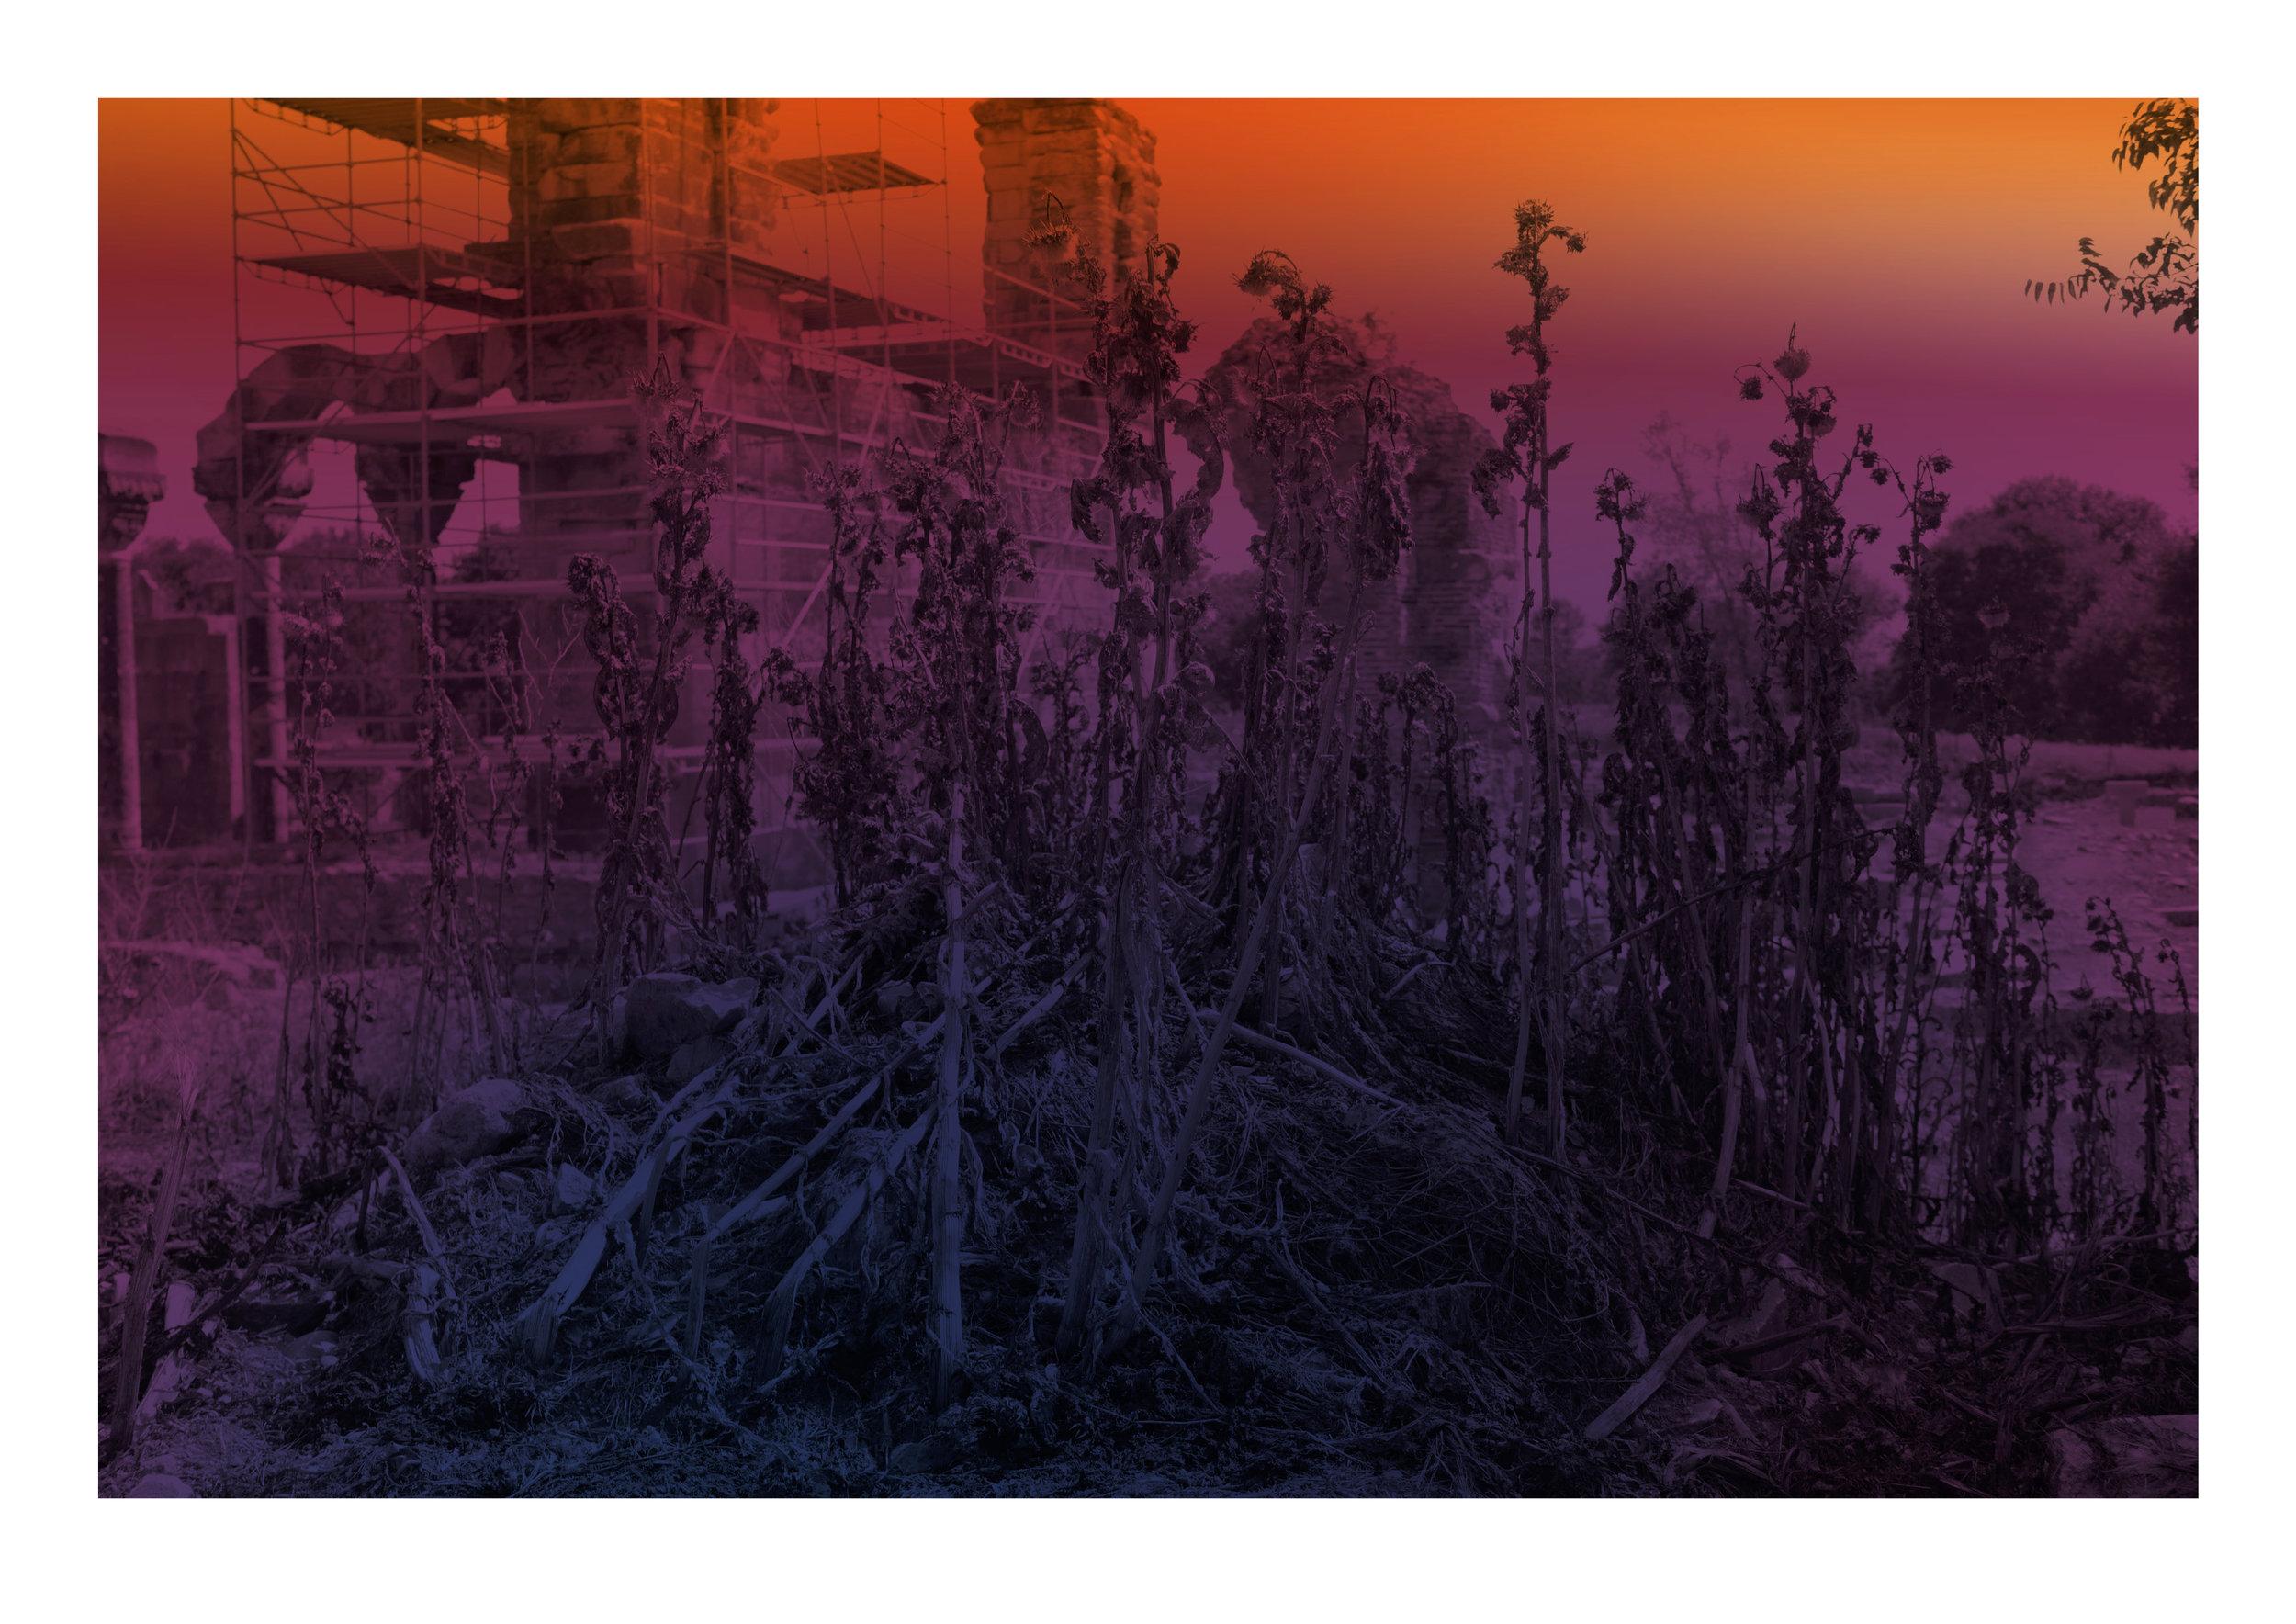 Sylvain+Couzinet-Jacques+Parallax Maps_2018_+Double+V+Gallery_Marseille.jpg